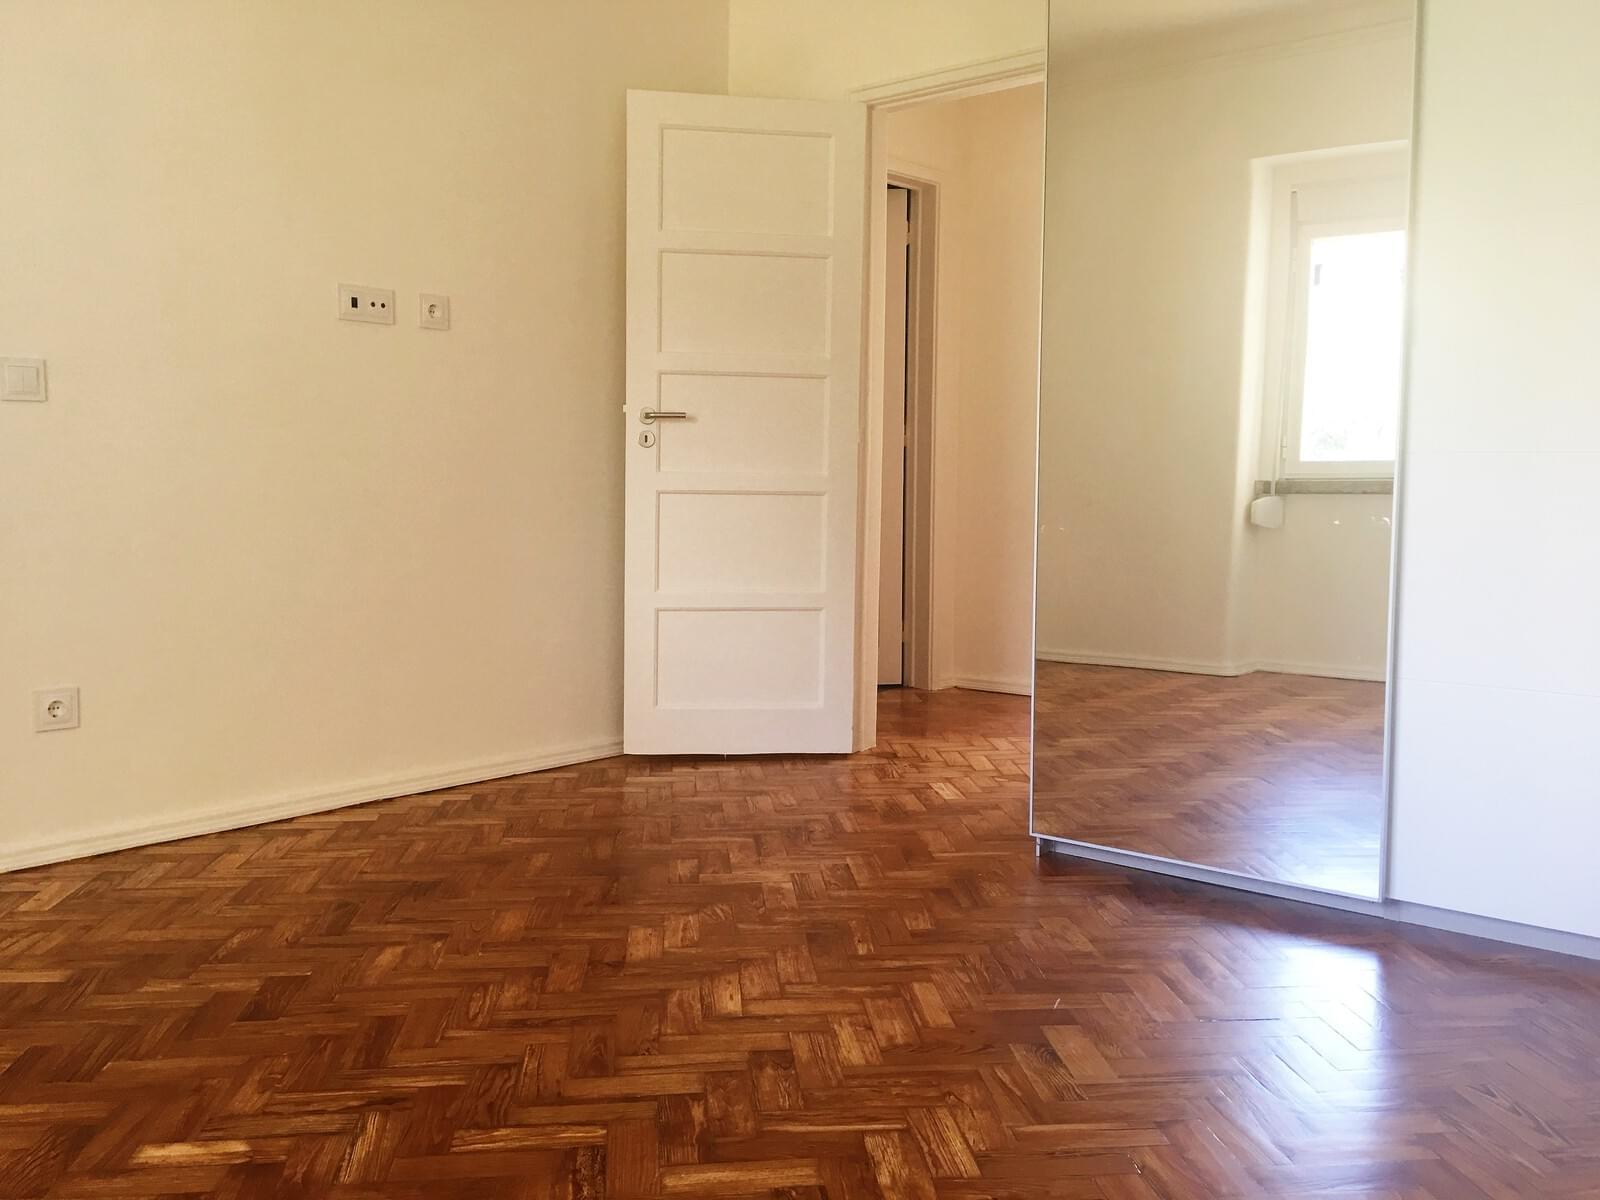 pf17642-apartamento-t3-lisboa-03660e12-9511-4202-a1e4-685bb8c63d04